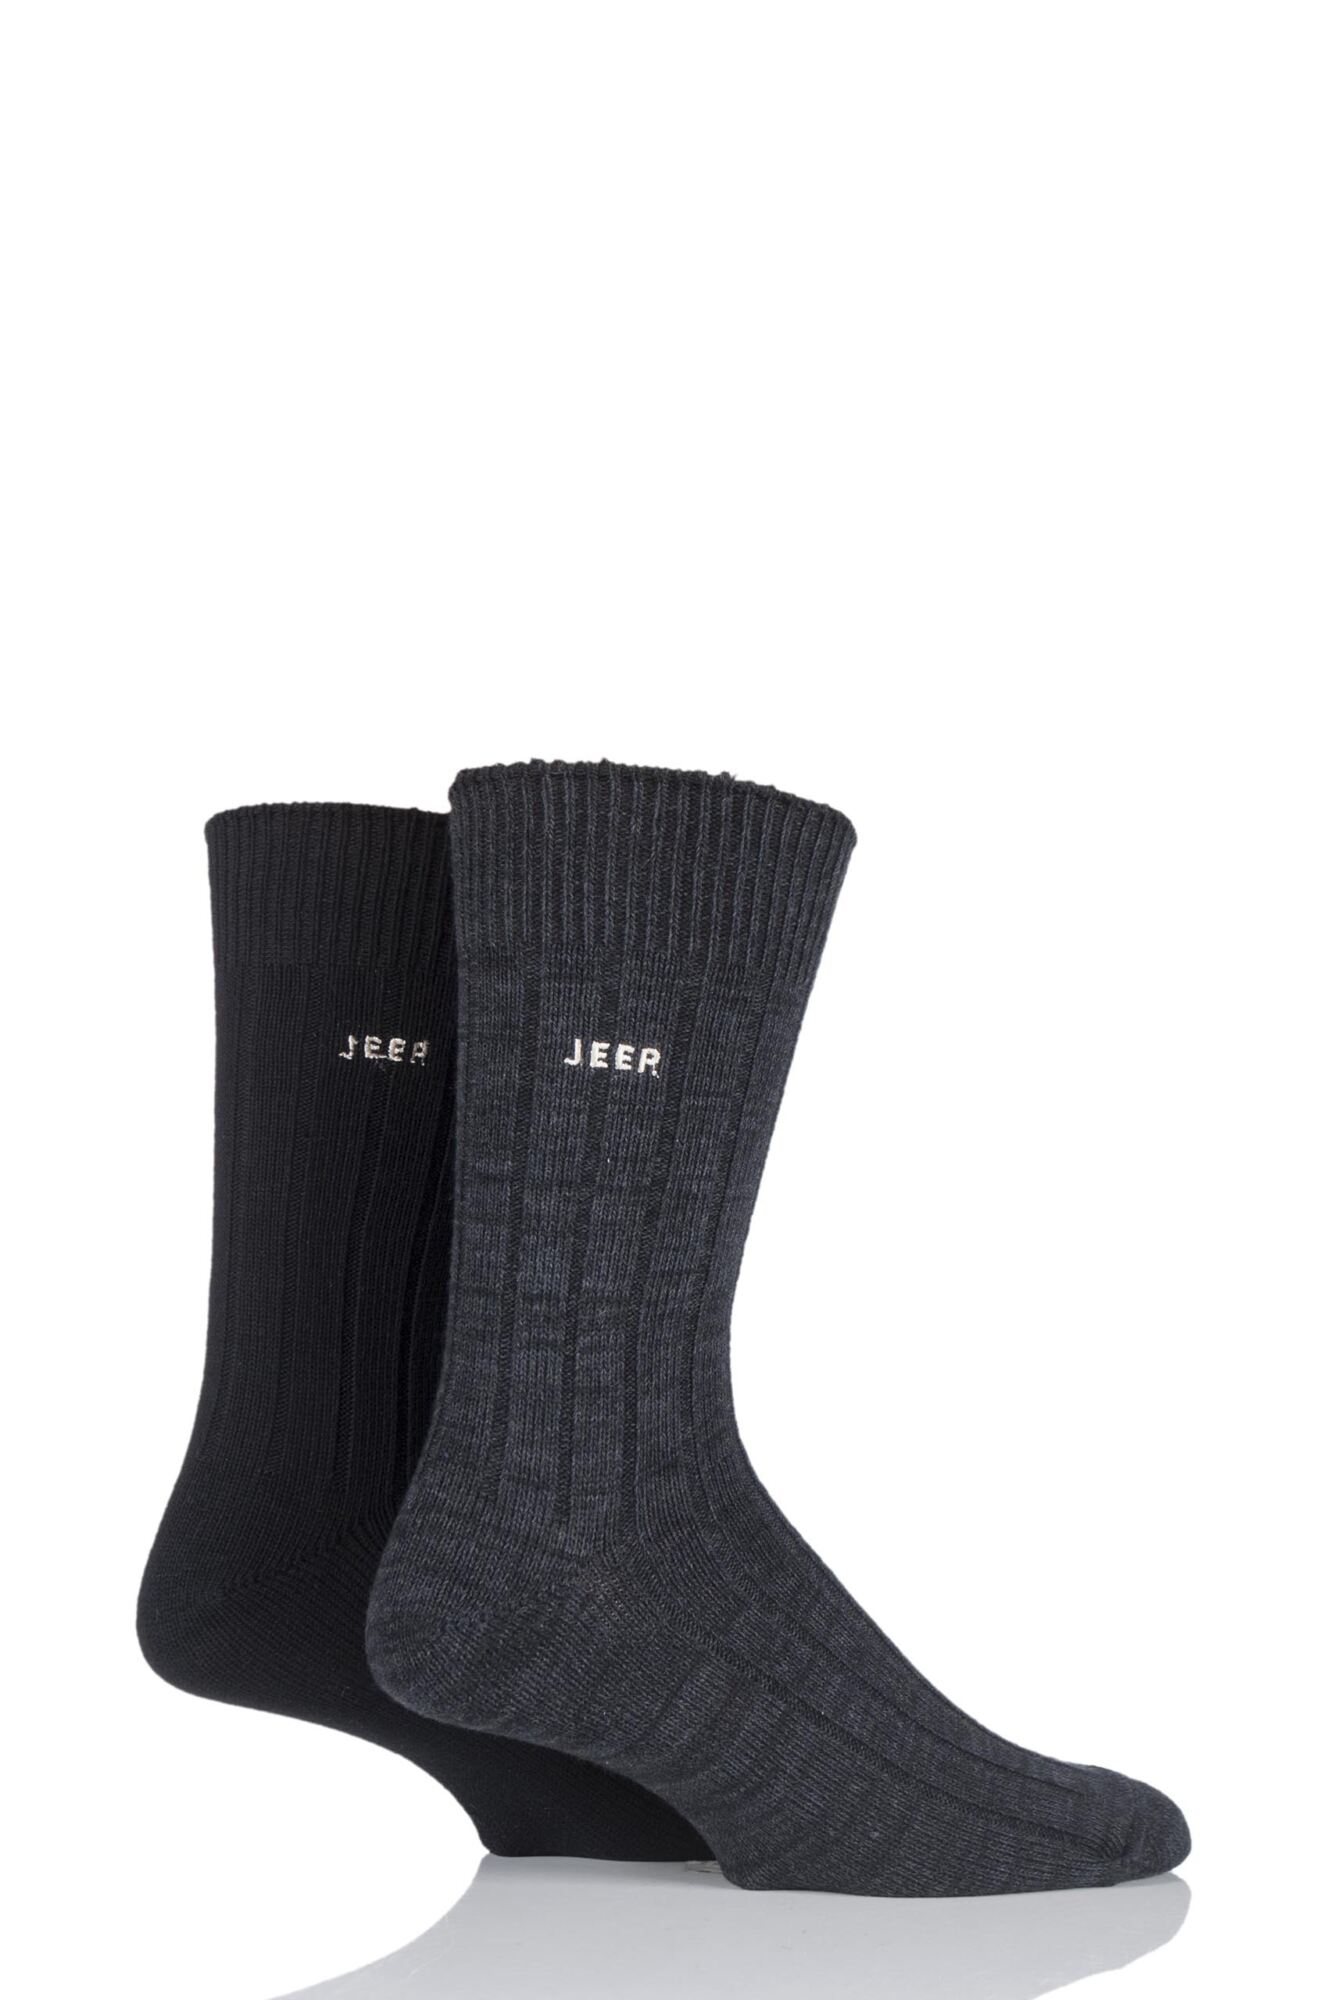 2 Pair Spirit Cotton Socks Men's - Jeep